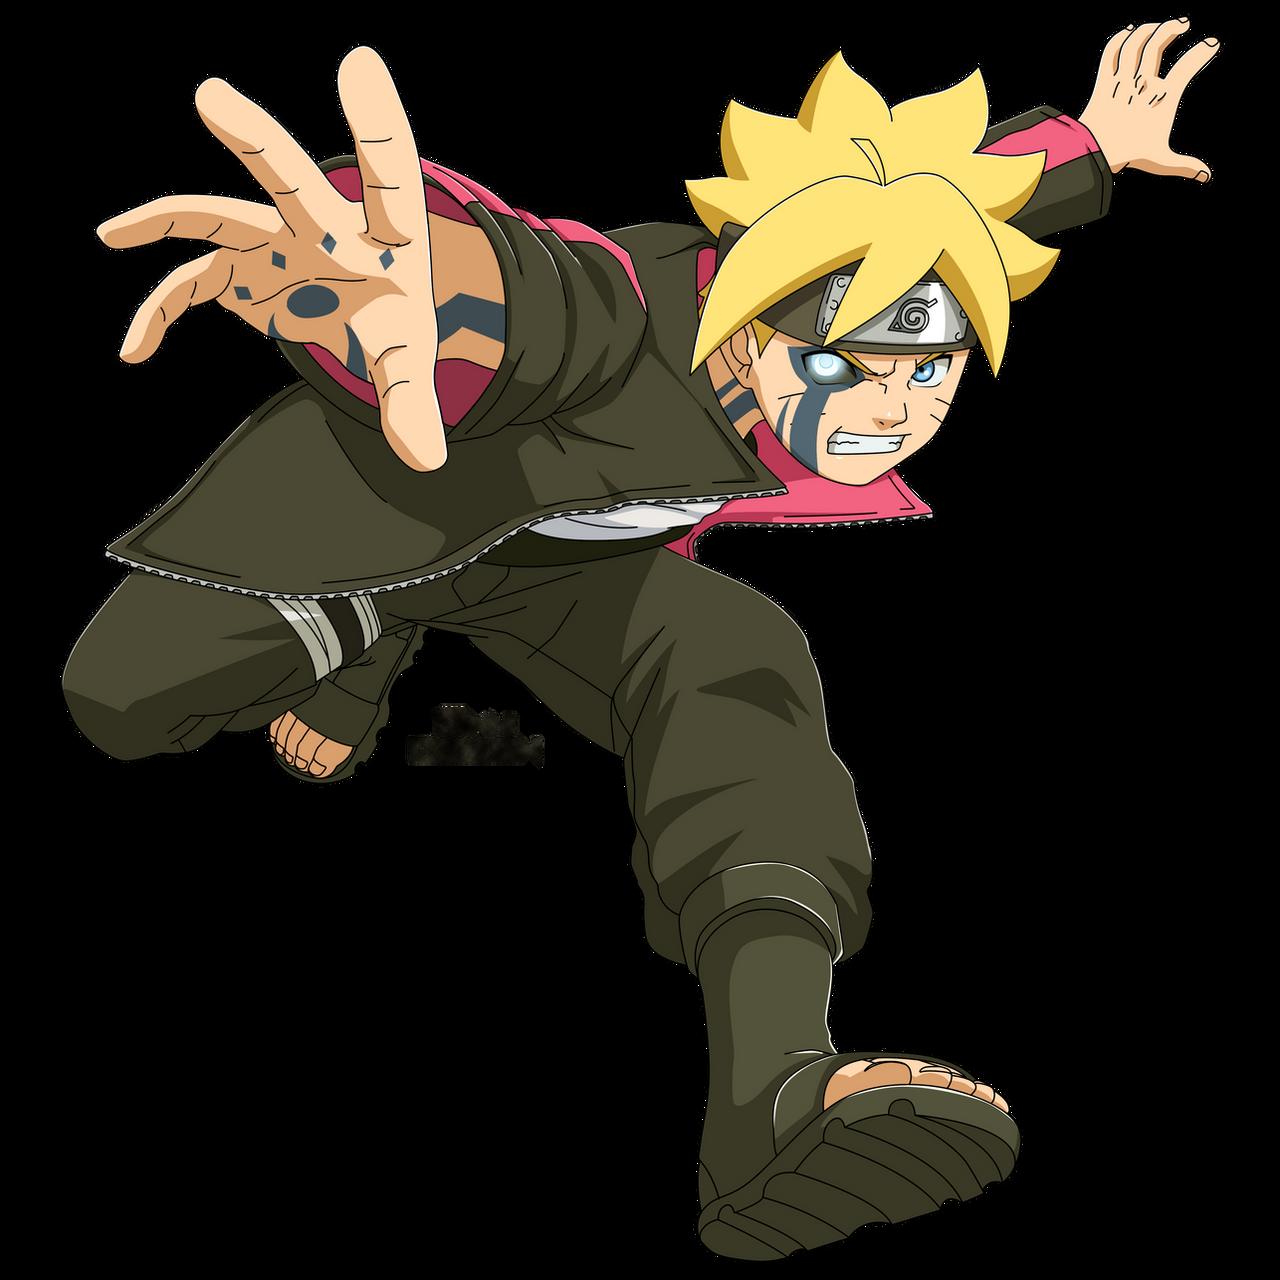 Boruto Naruto Next Generation Boruto Kama Jougan By Iennidesign On Deviantart